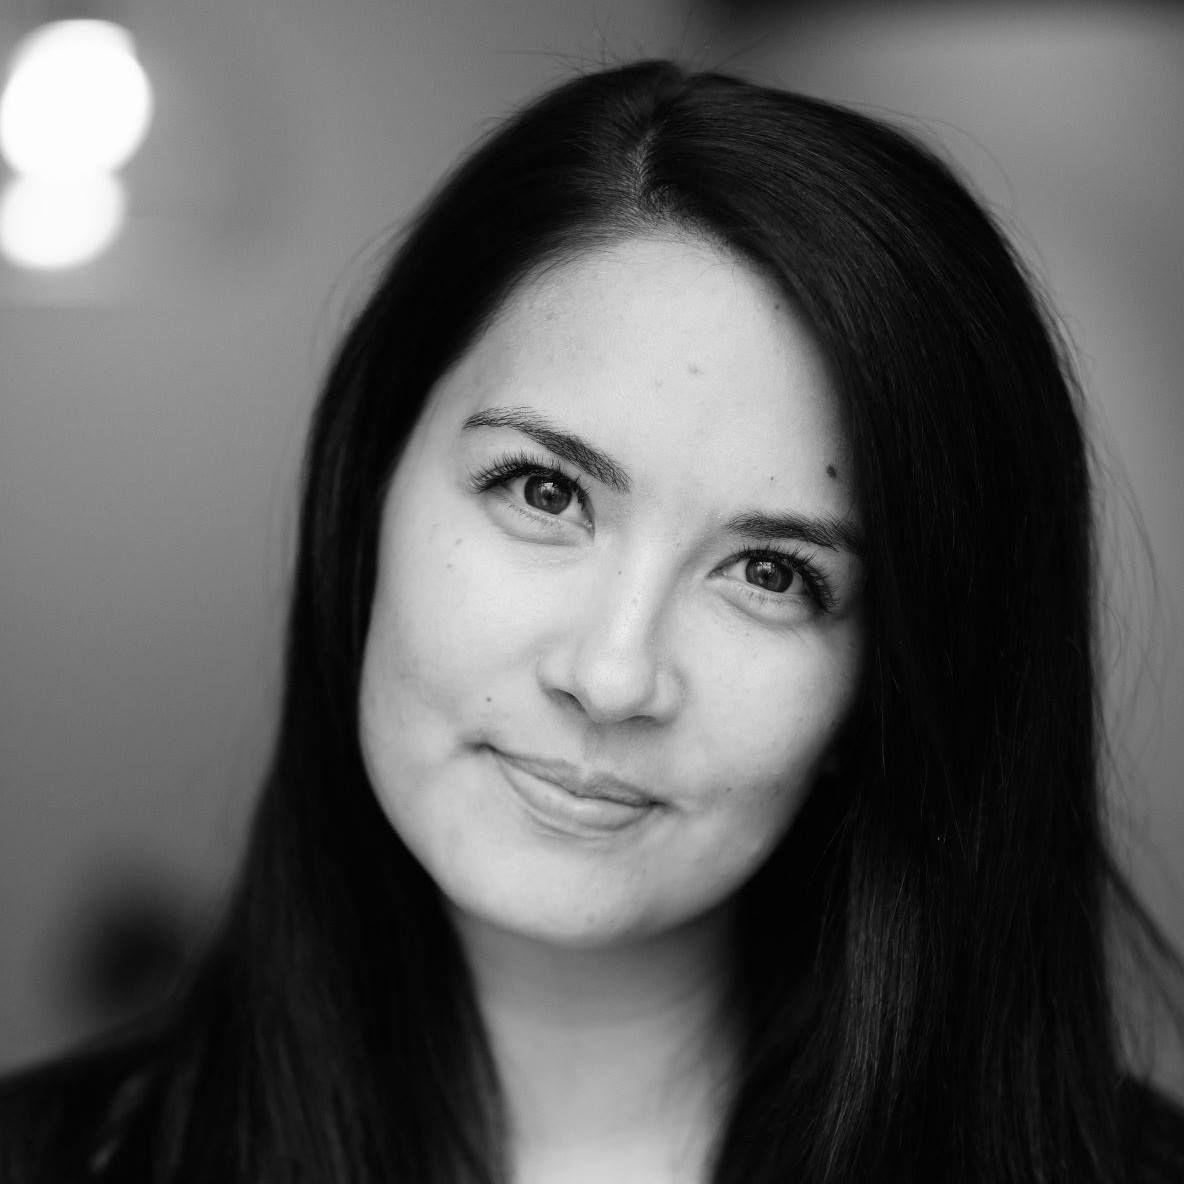 Oda Simone Mancilla Leirvik